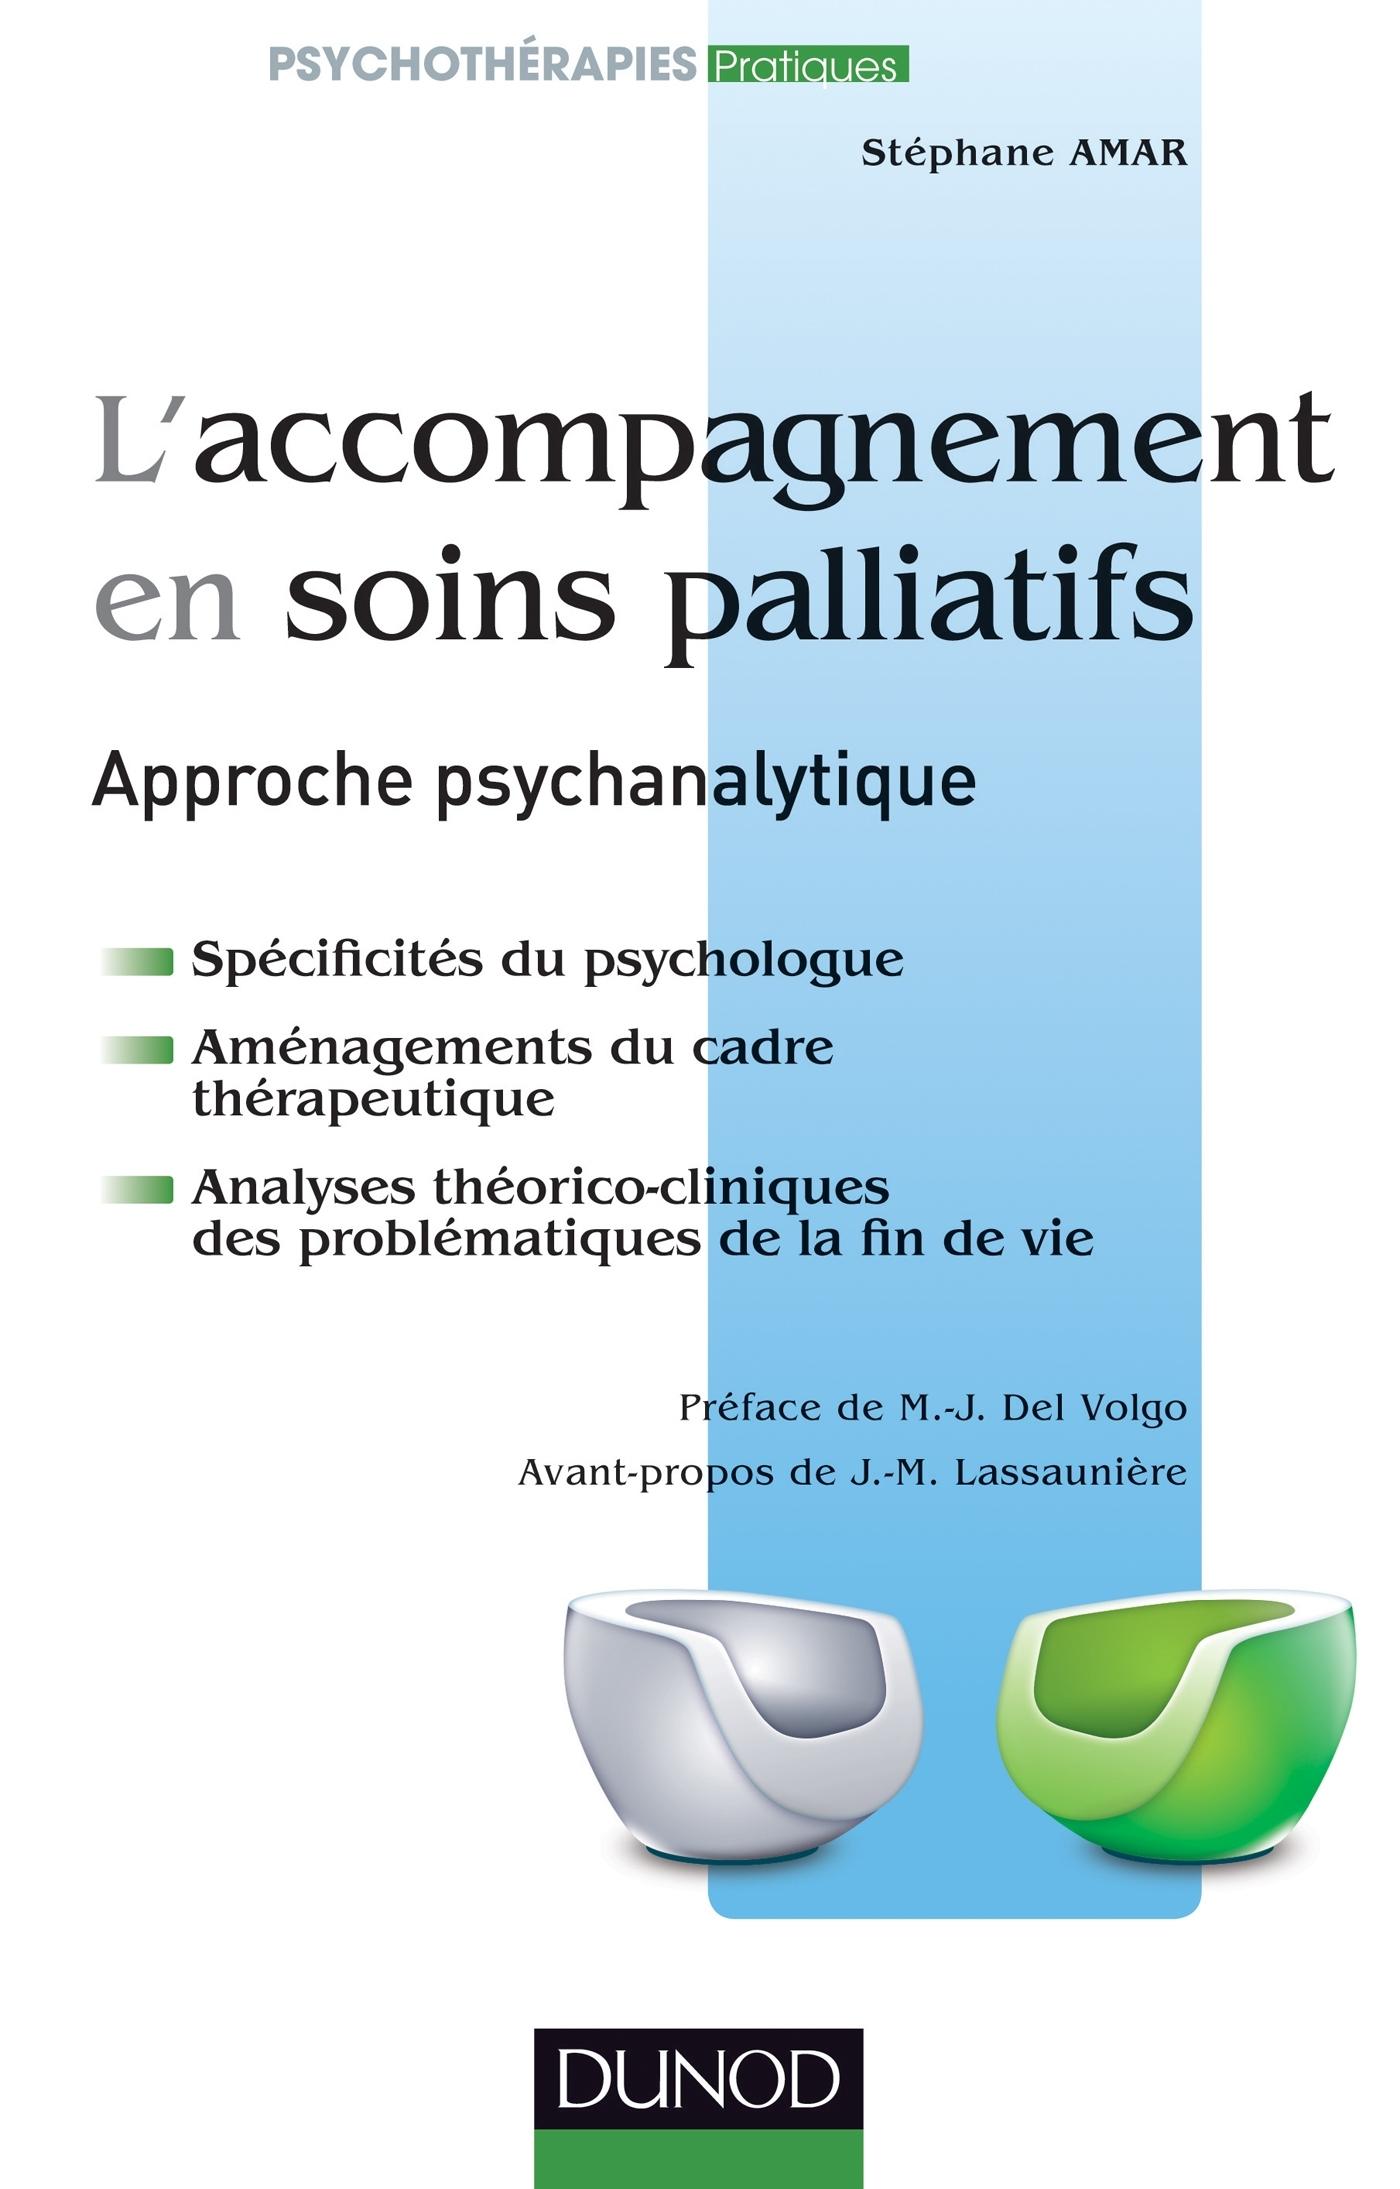 L'ACCOMPAGNEMENT EN SOINS PALLIATIFS - APPROCHE PSYCHANALYTIQUE